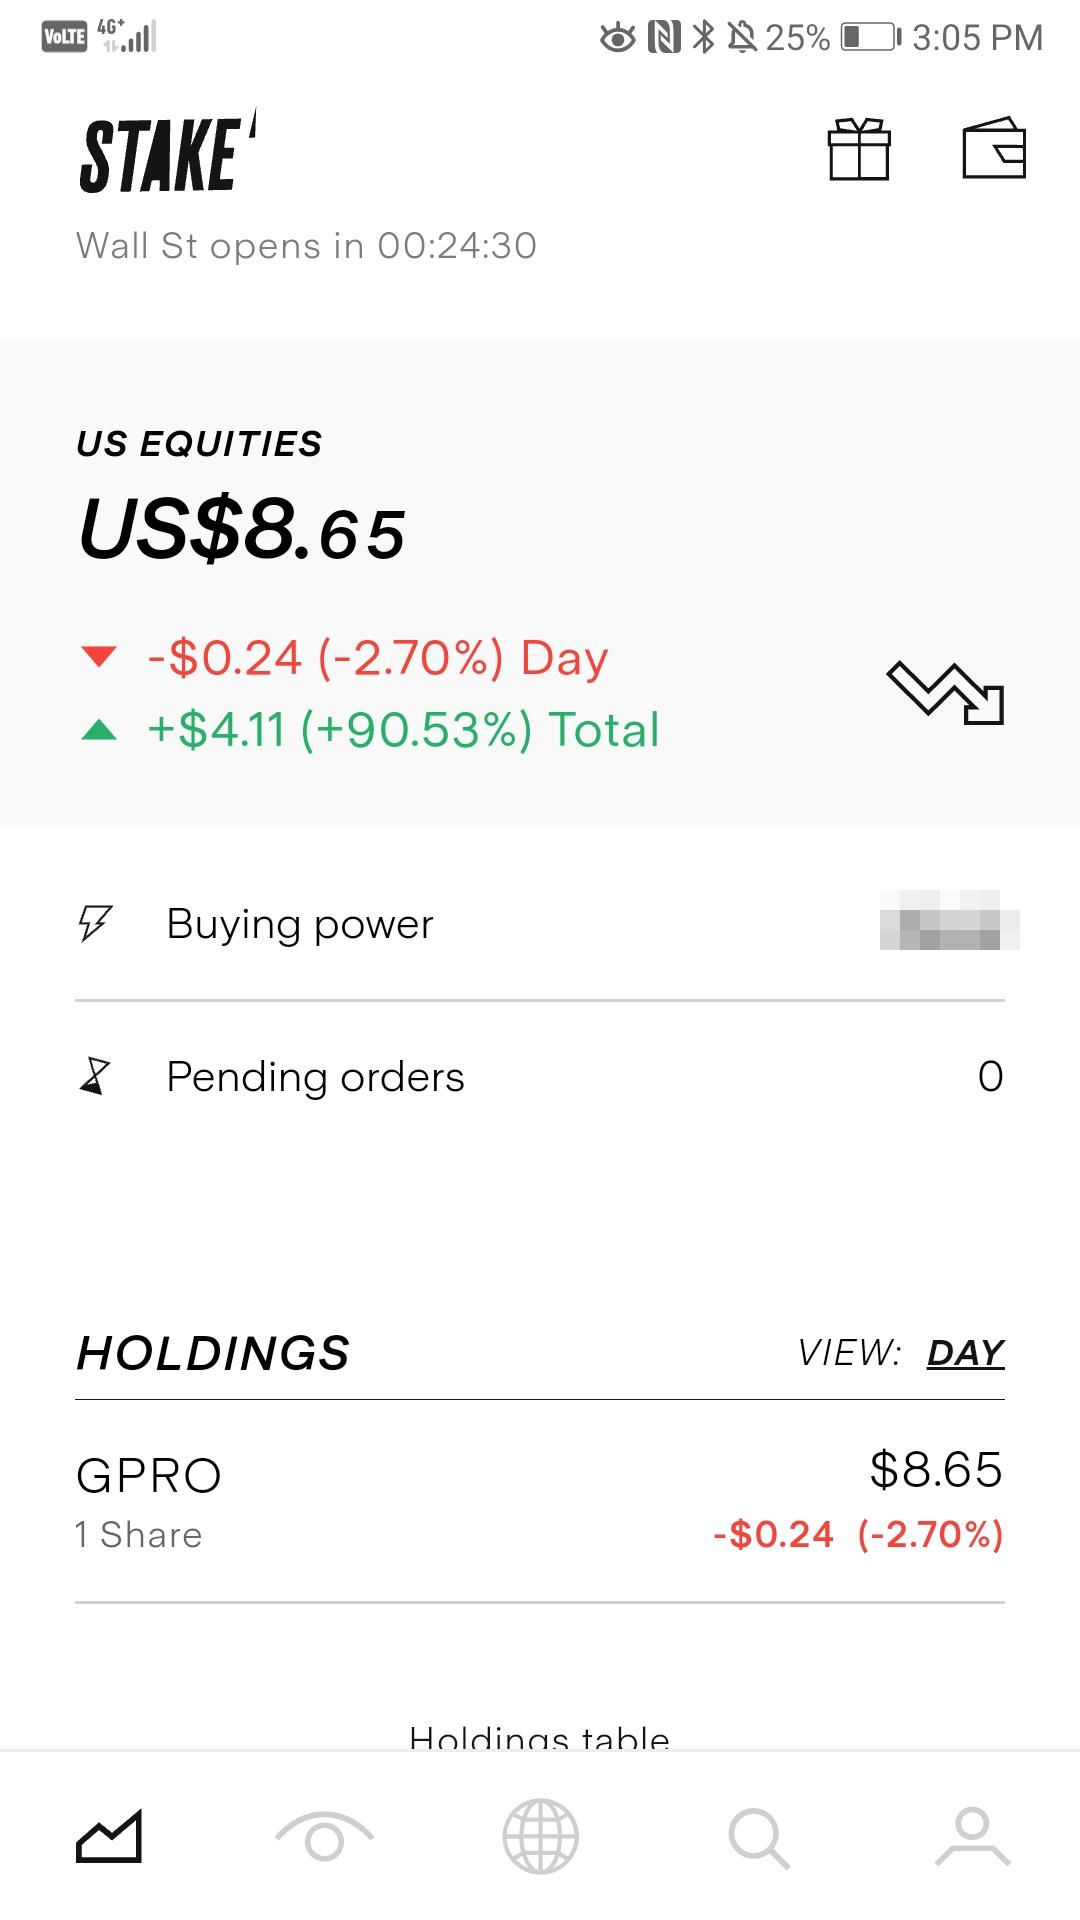 Stake review - Mobile trading platform